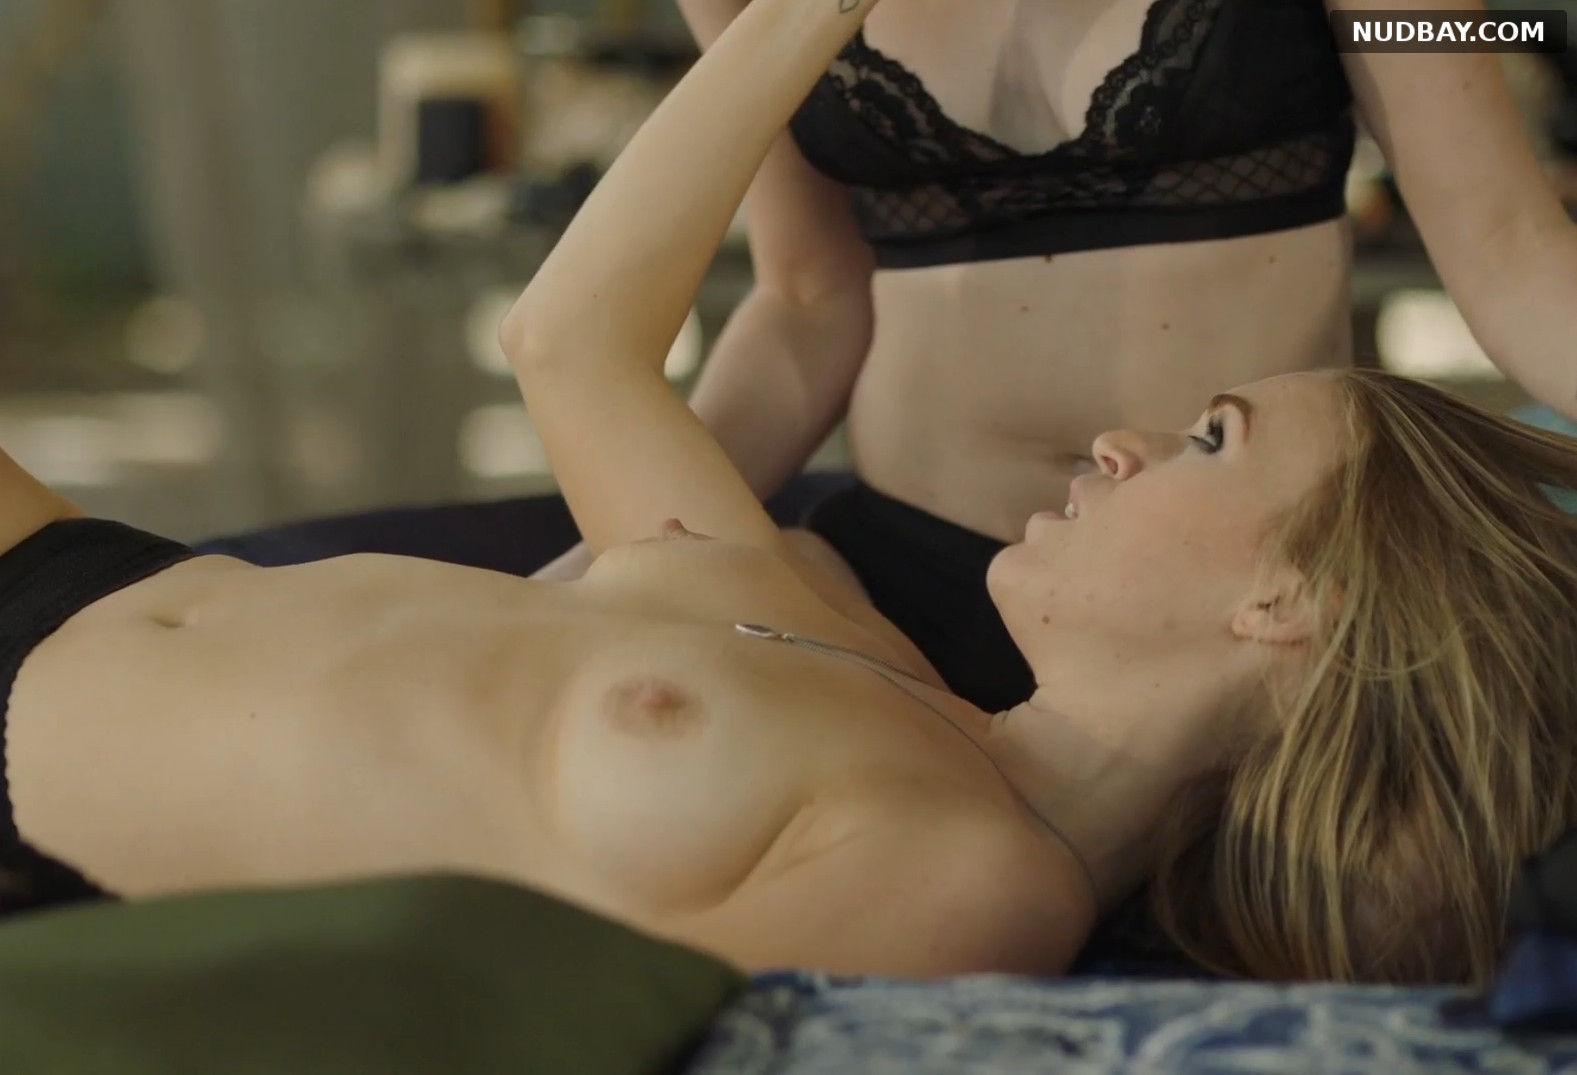 Miranda O'Hare nude